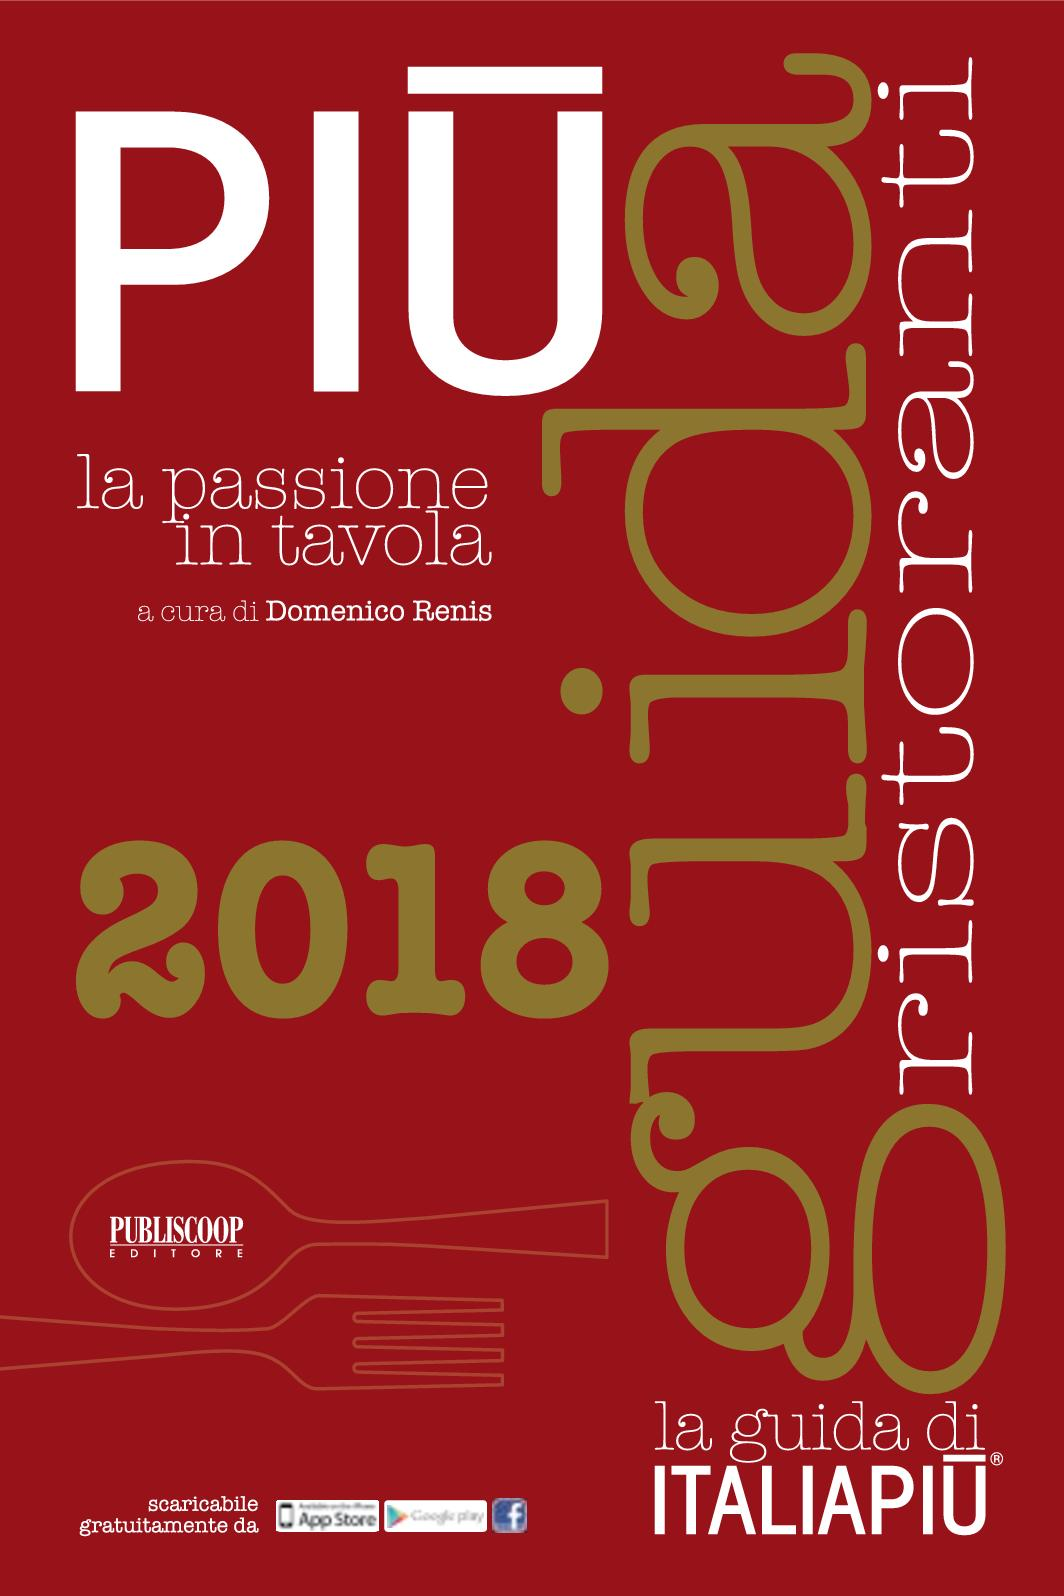 Calaméo Più Guida Ristoranti 2018